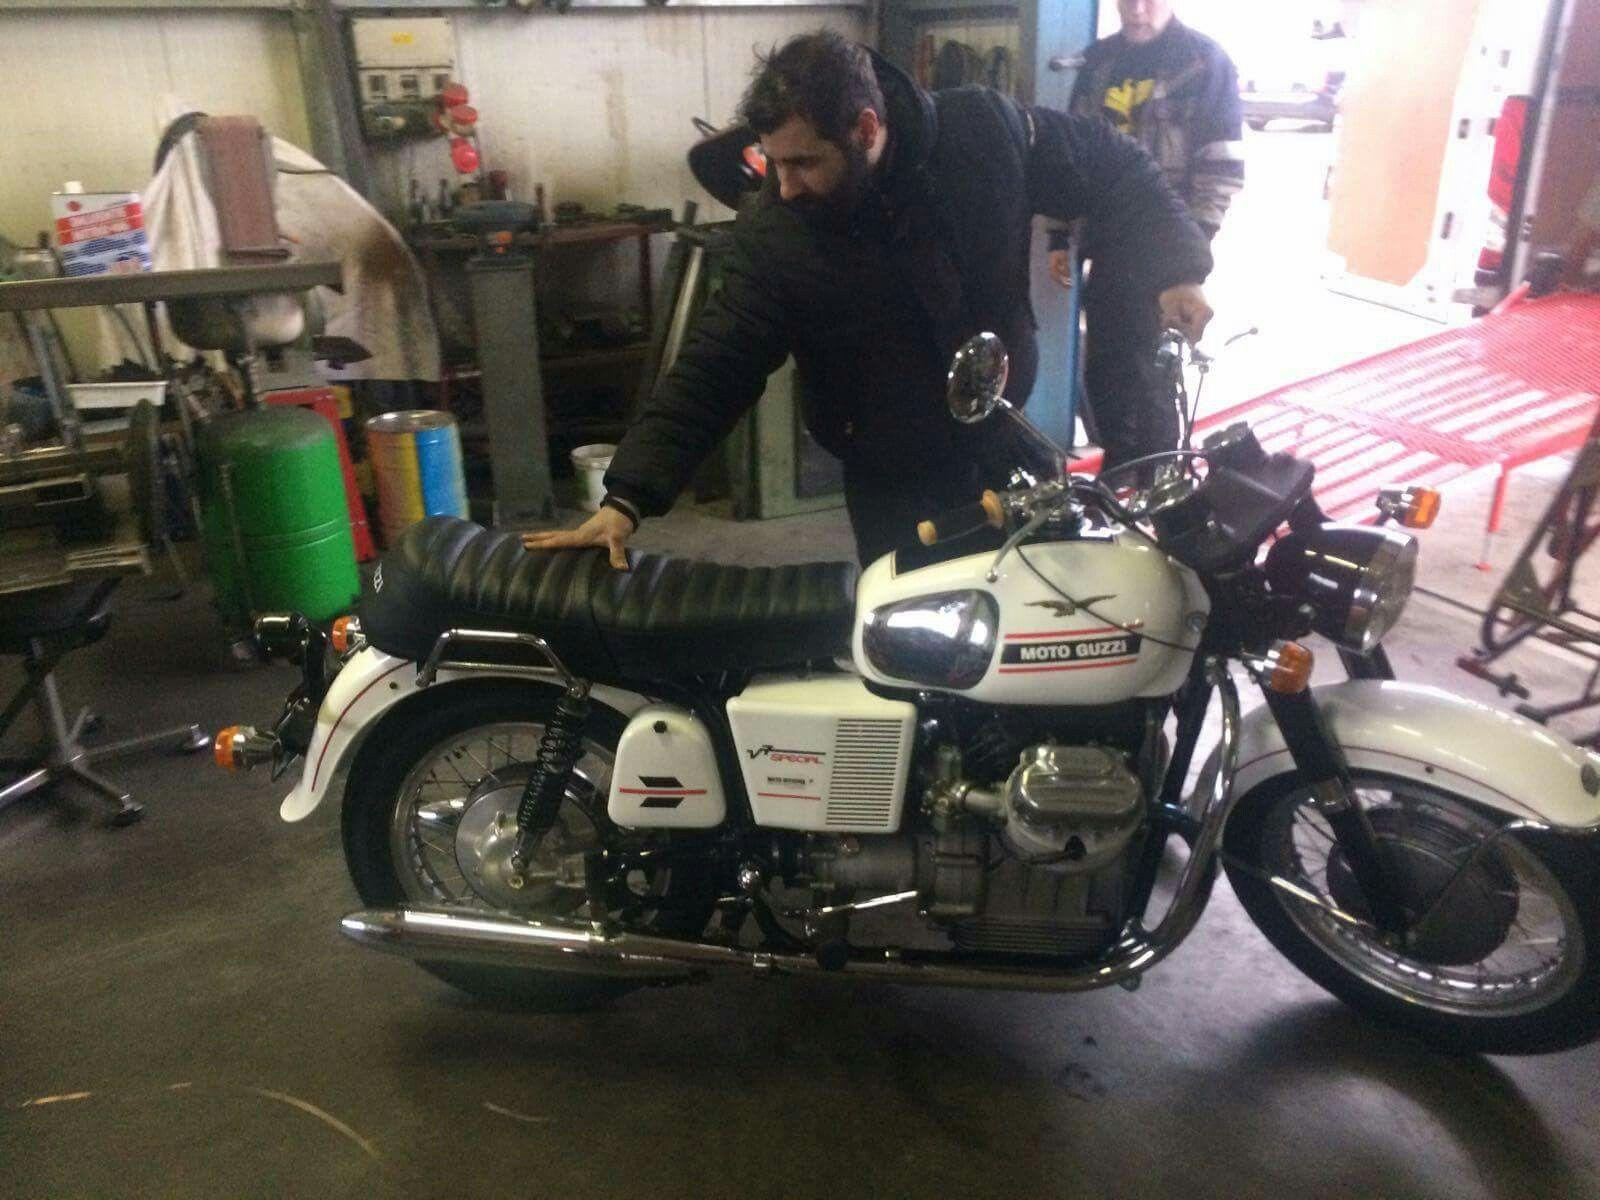 Richard's 1970 Moto Guzzi V7 Special left our workshop this morning in the safe hands of Chas Mortimer Ltd. motorcycle transportation (y)  #motoguzzi #v7special #chasmortimer #motoofficina